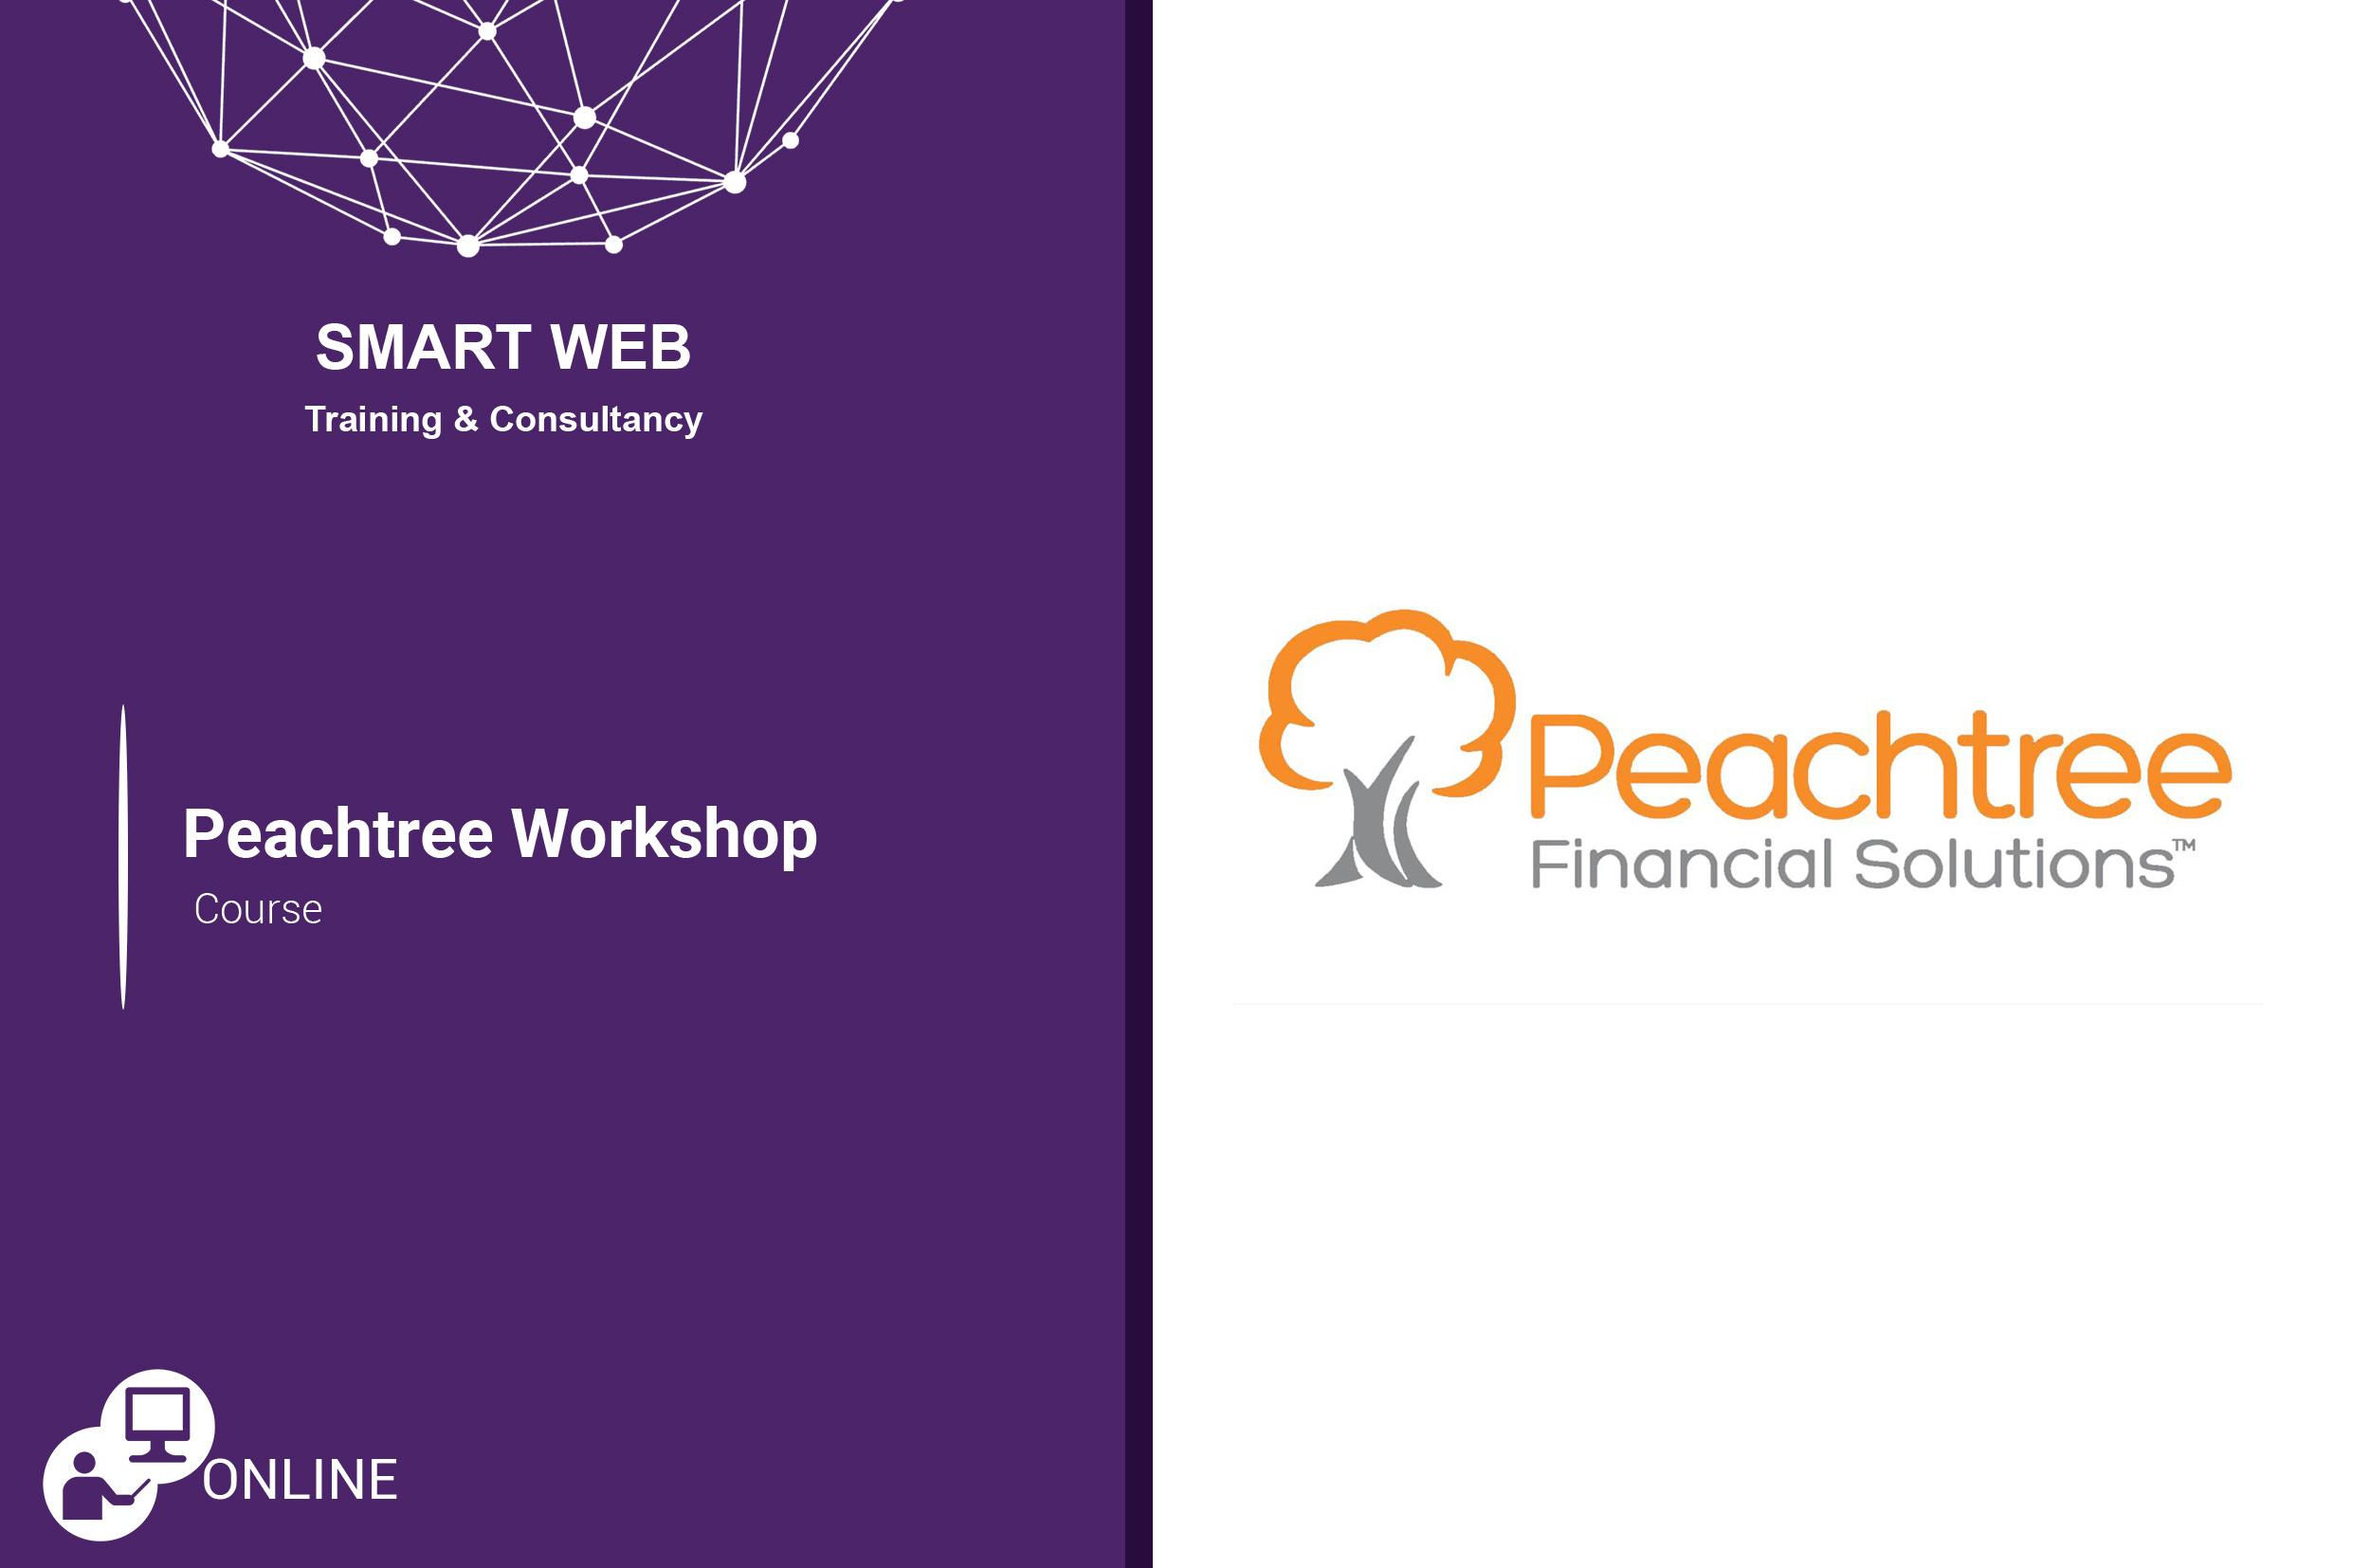 Peachtree Workshop